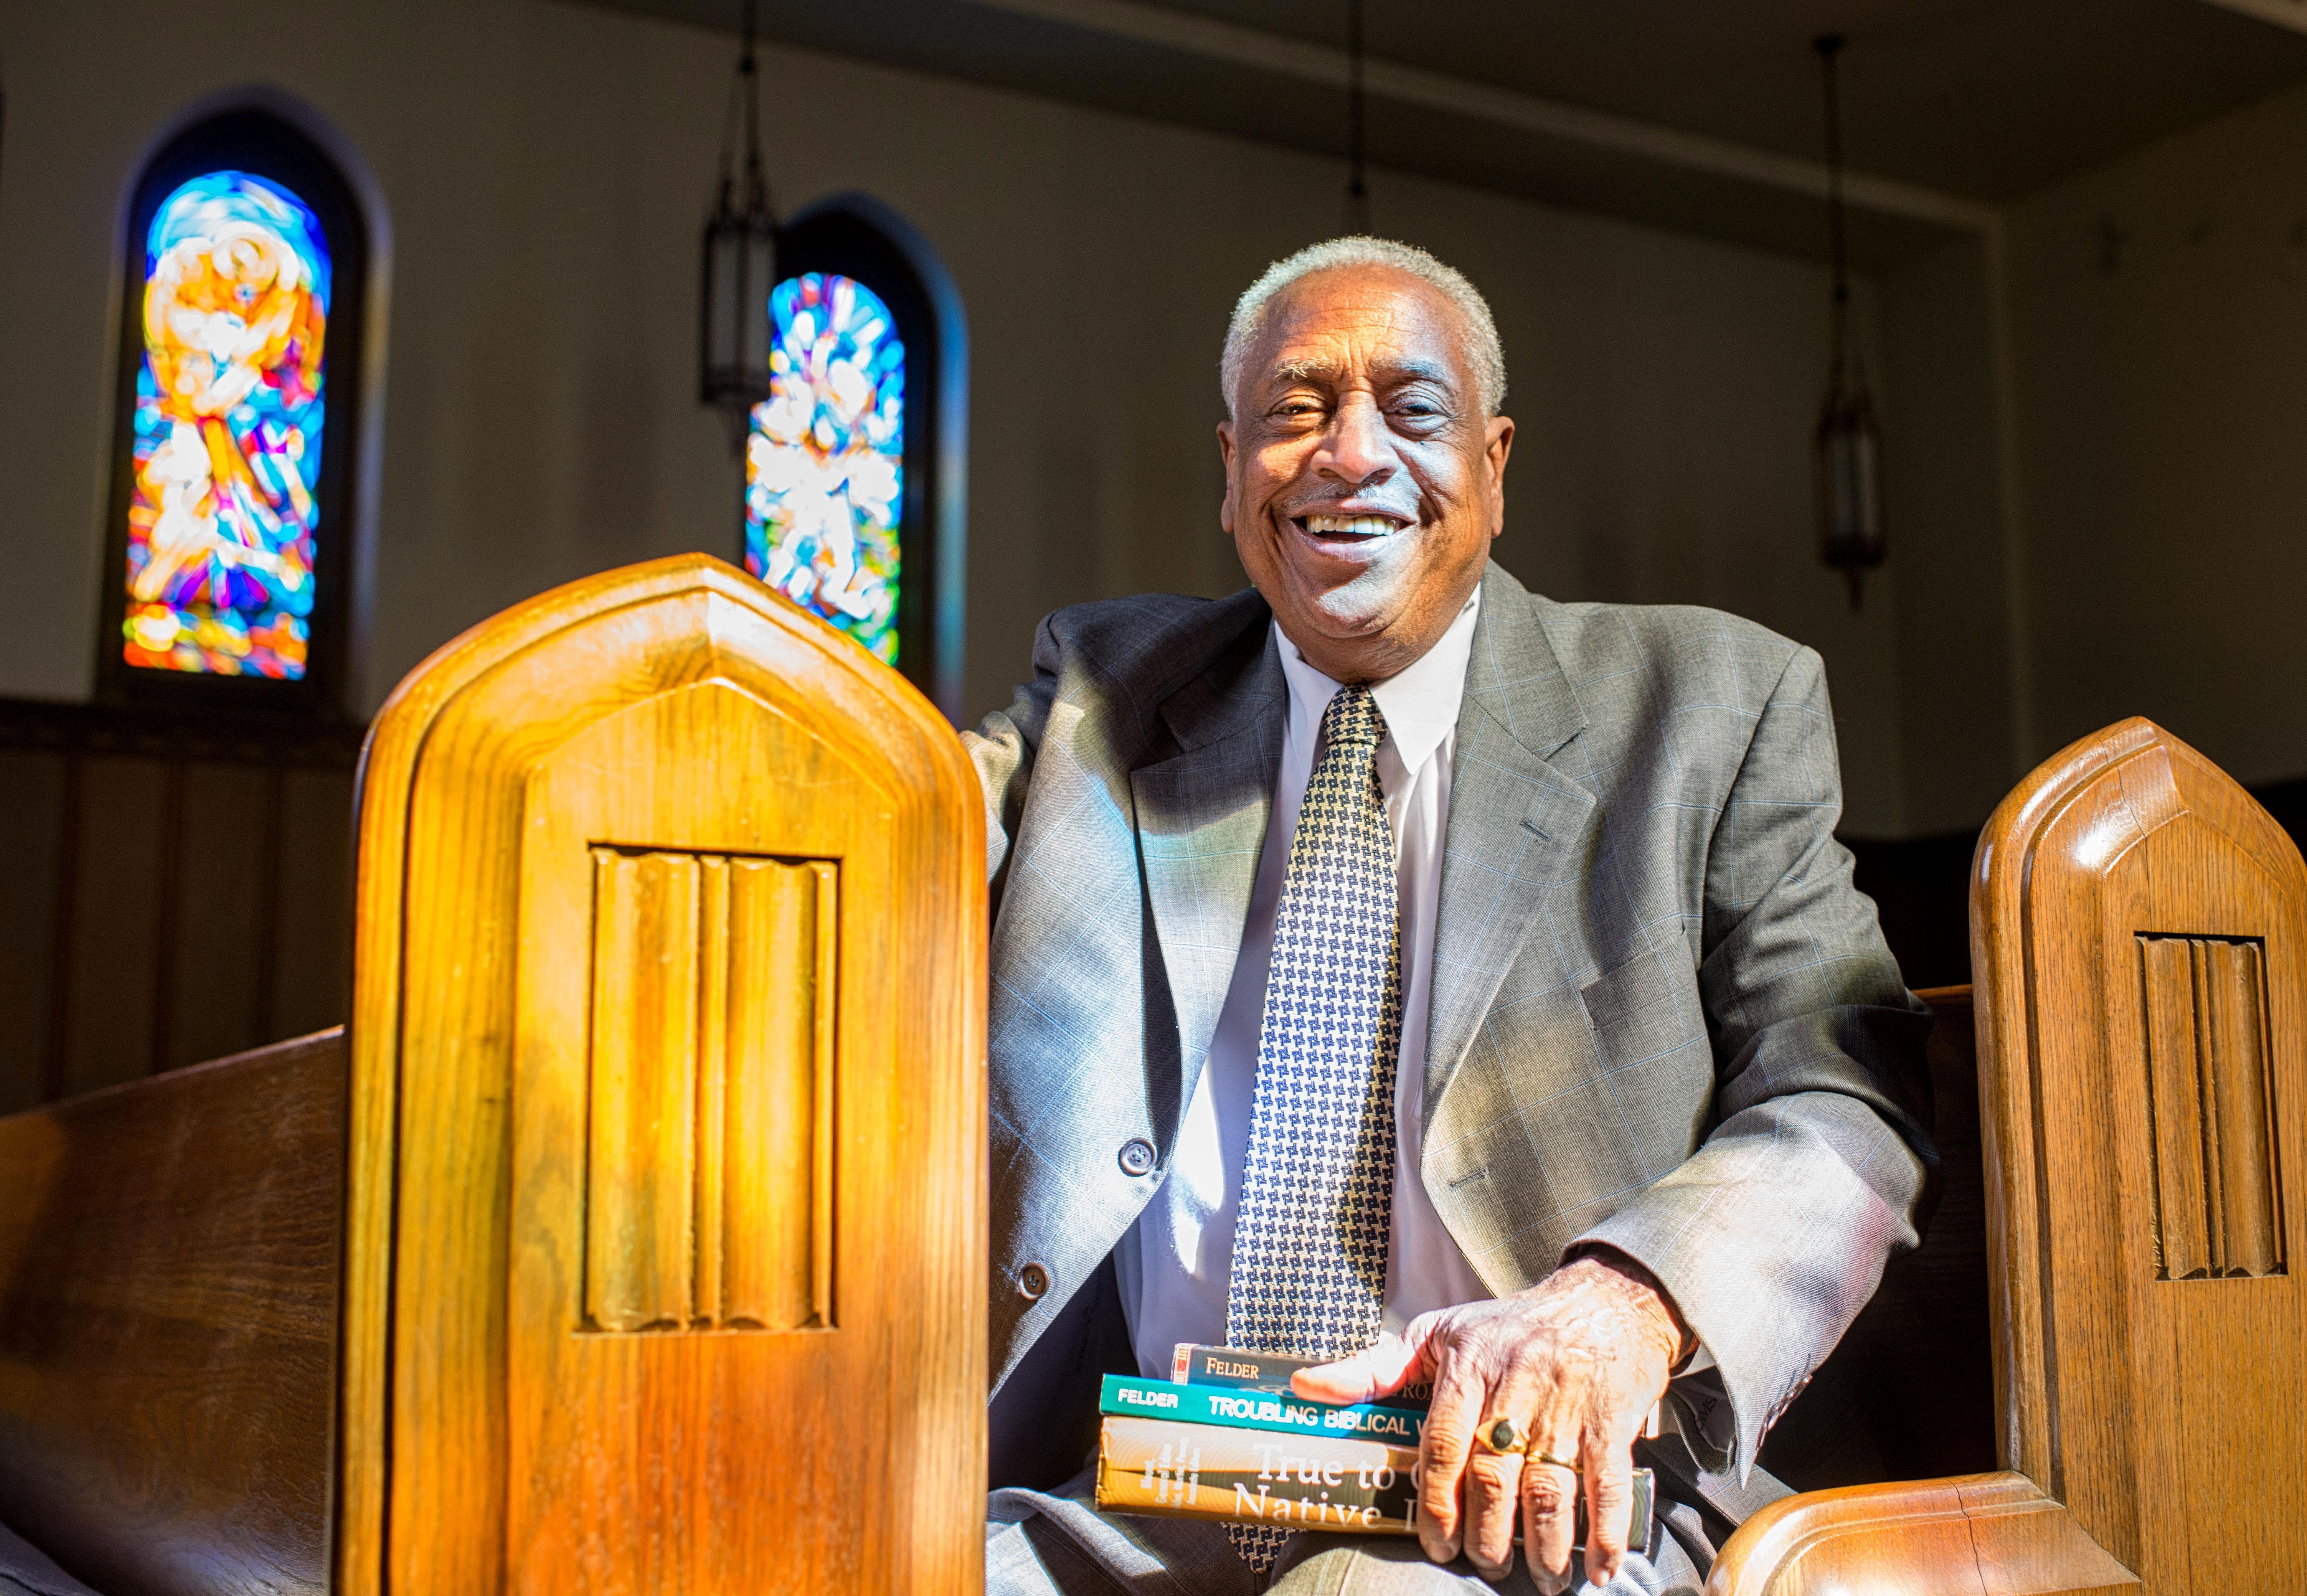 Cain Hope Felder, June 9, 1943-Oct. 1, 2019. Photo courtesy of JK Photography, Howard University